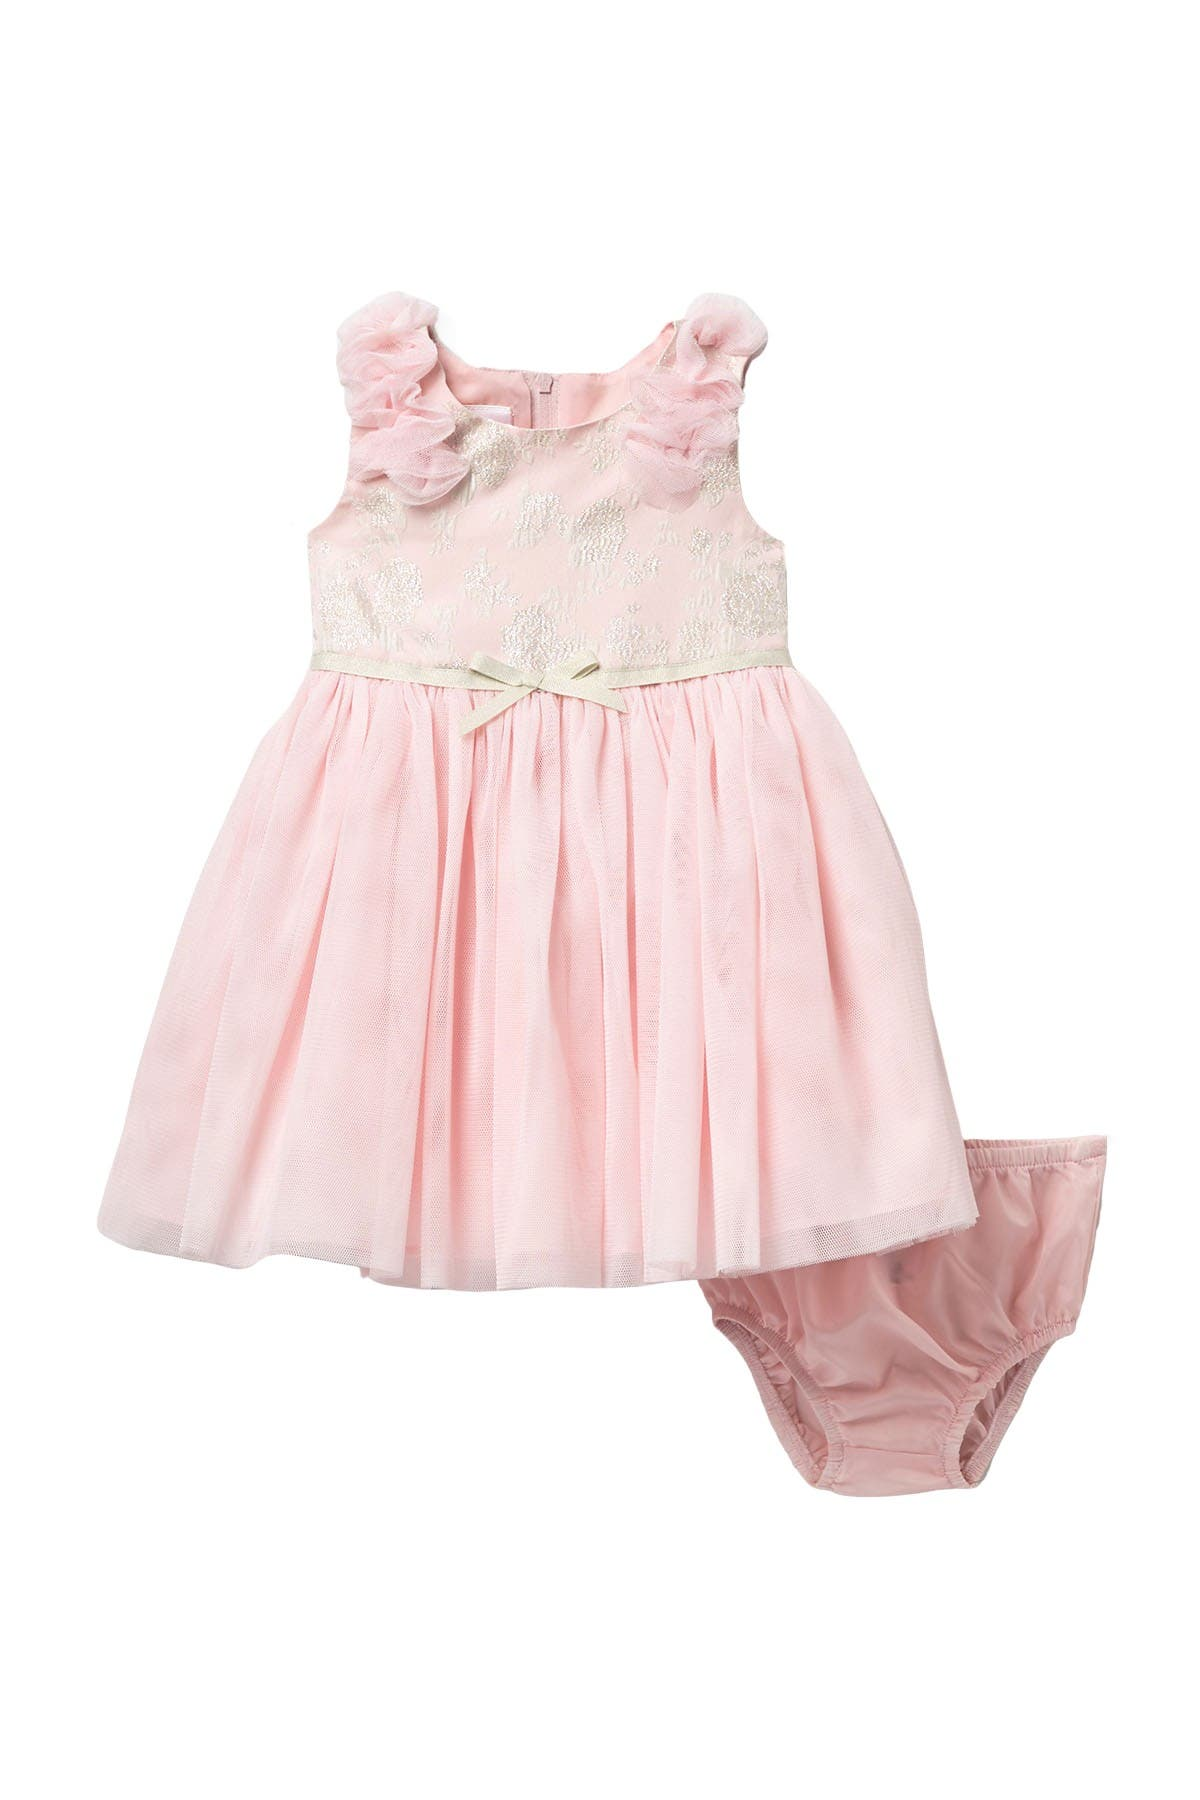 Image of Iris & Ivy Sleeveless Puff Shoulder Jacquard Dress & Bloomer Set